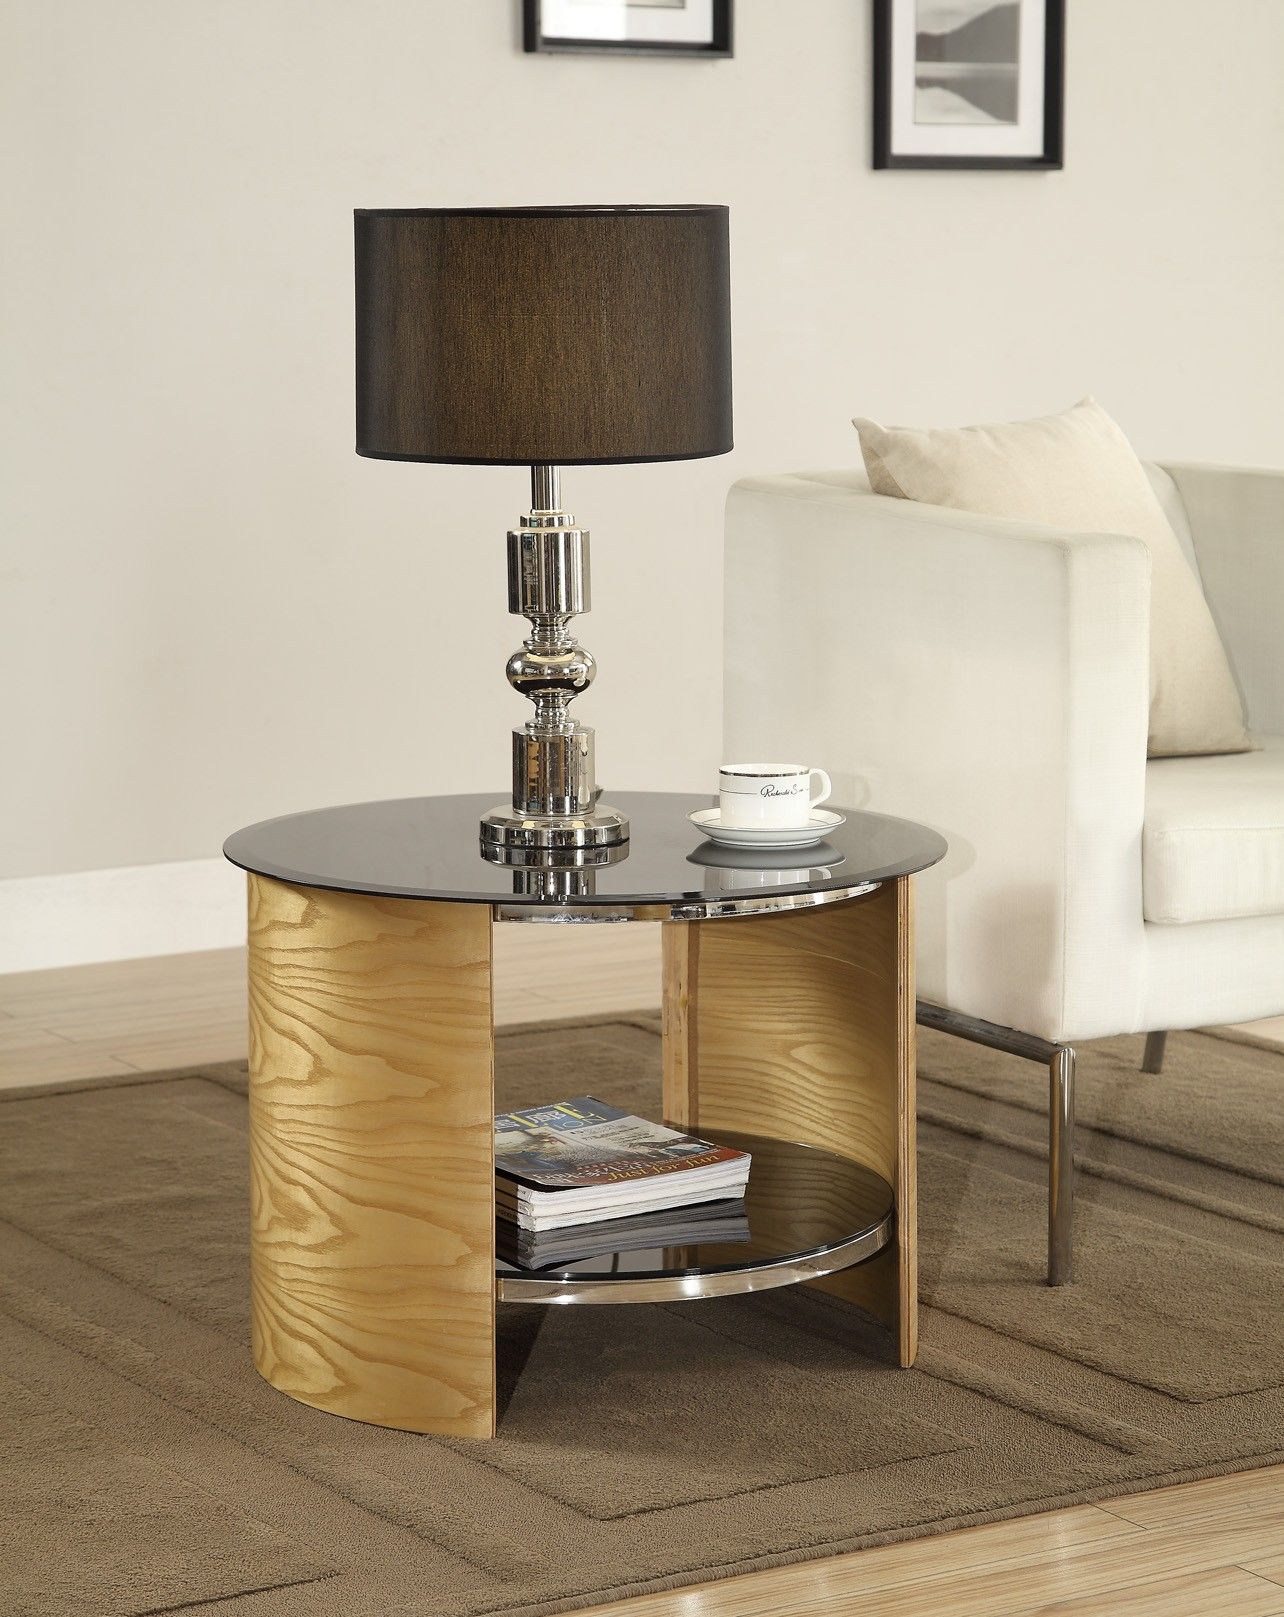 Jual Furnishings Jf303 Round Lamp